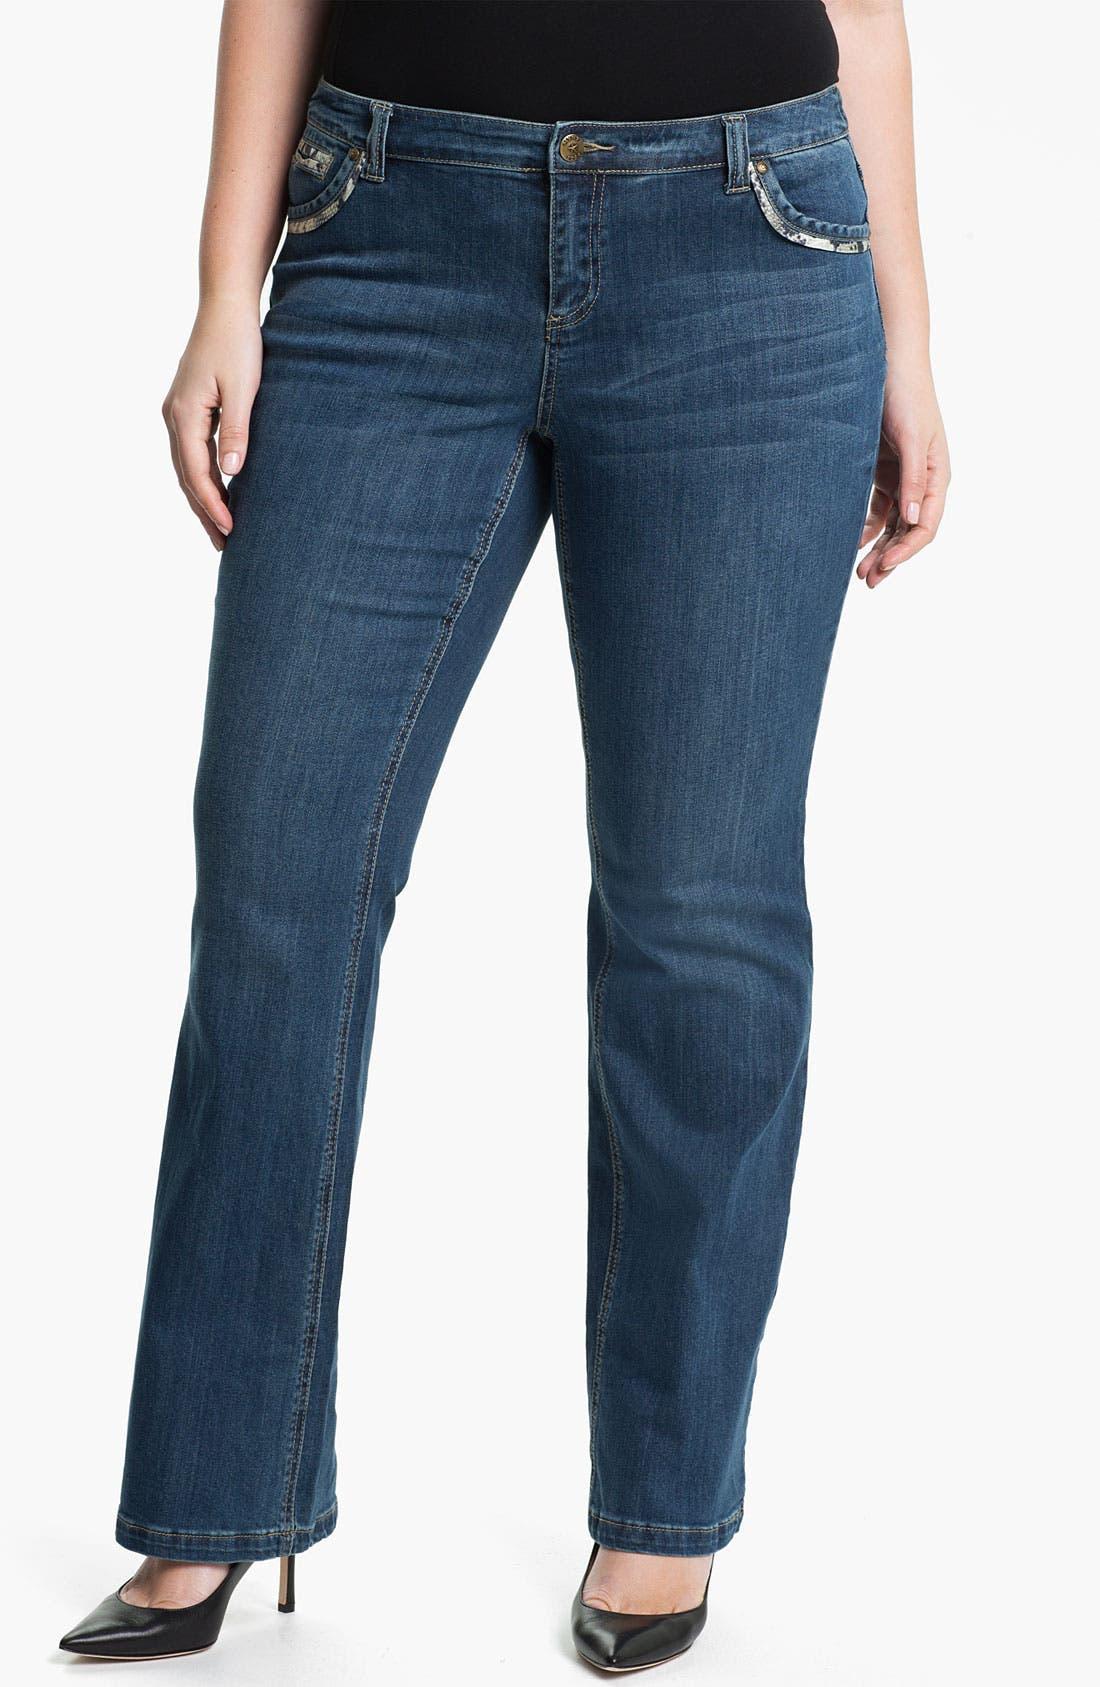 Alternate Image 1 Selected - Mynt 1792 'Broadway' Bootcut Jeans (Plus)